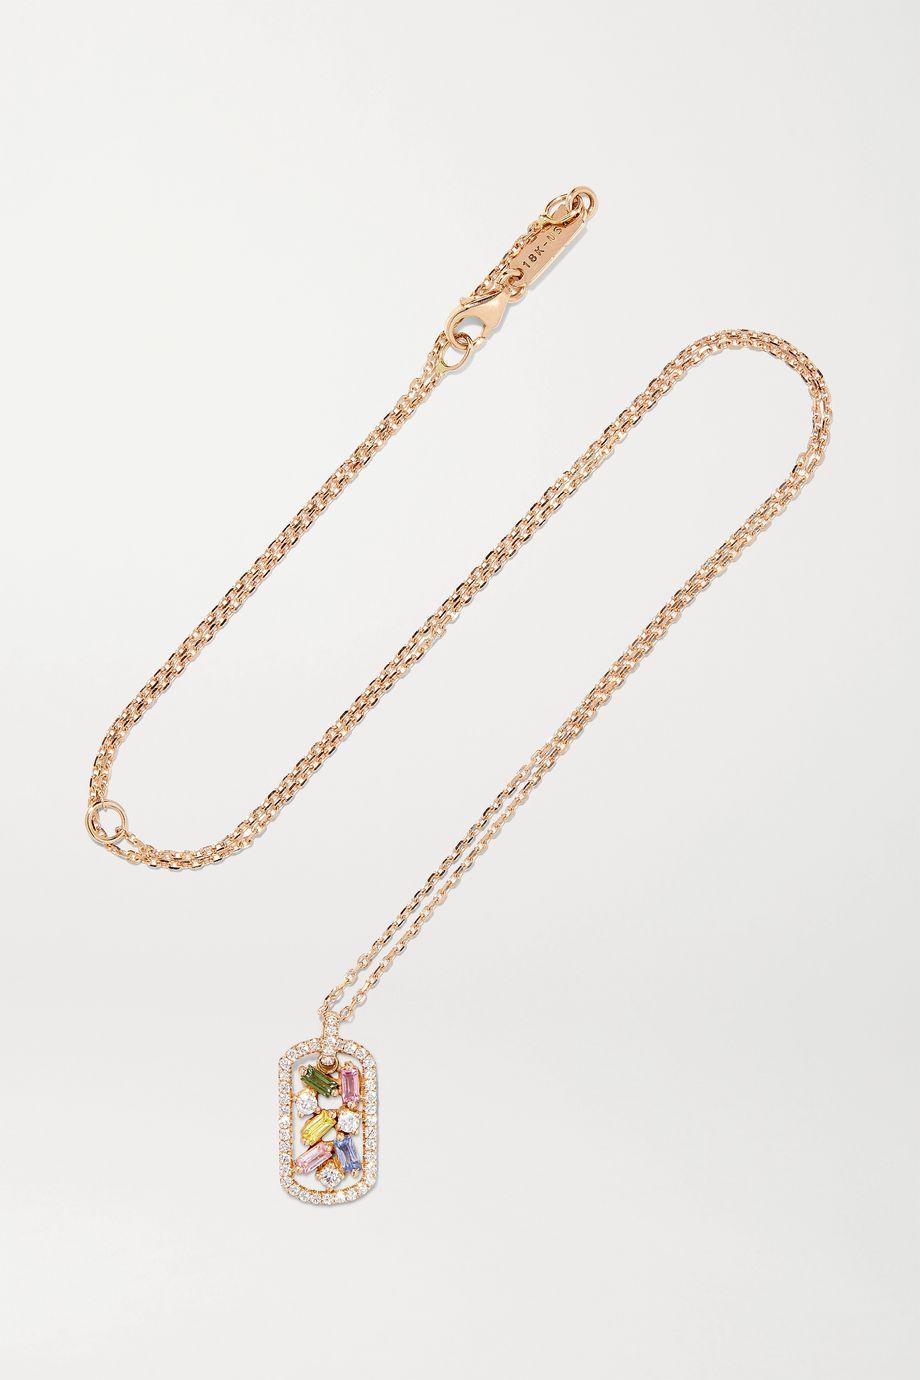 Suzanne Kalan 18-karat rose gold, sapphire and diamond necklace